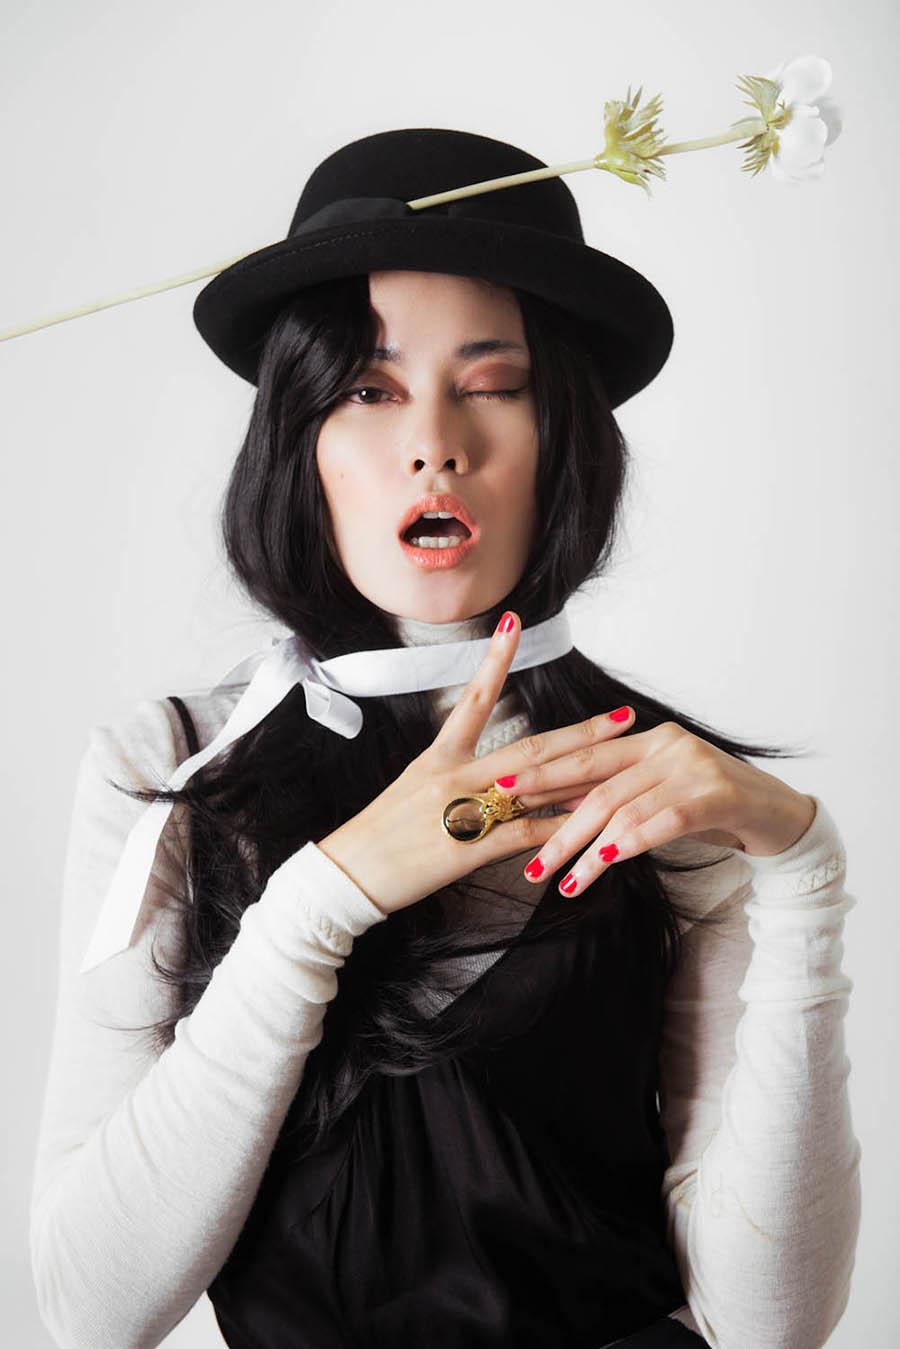 Dara Warganegara by Grego Gery for Grazia Indonesia November 2017